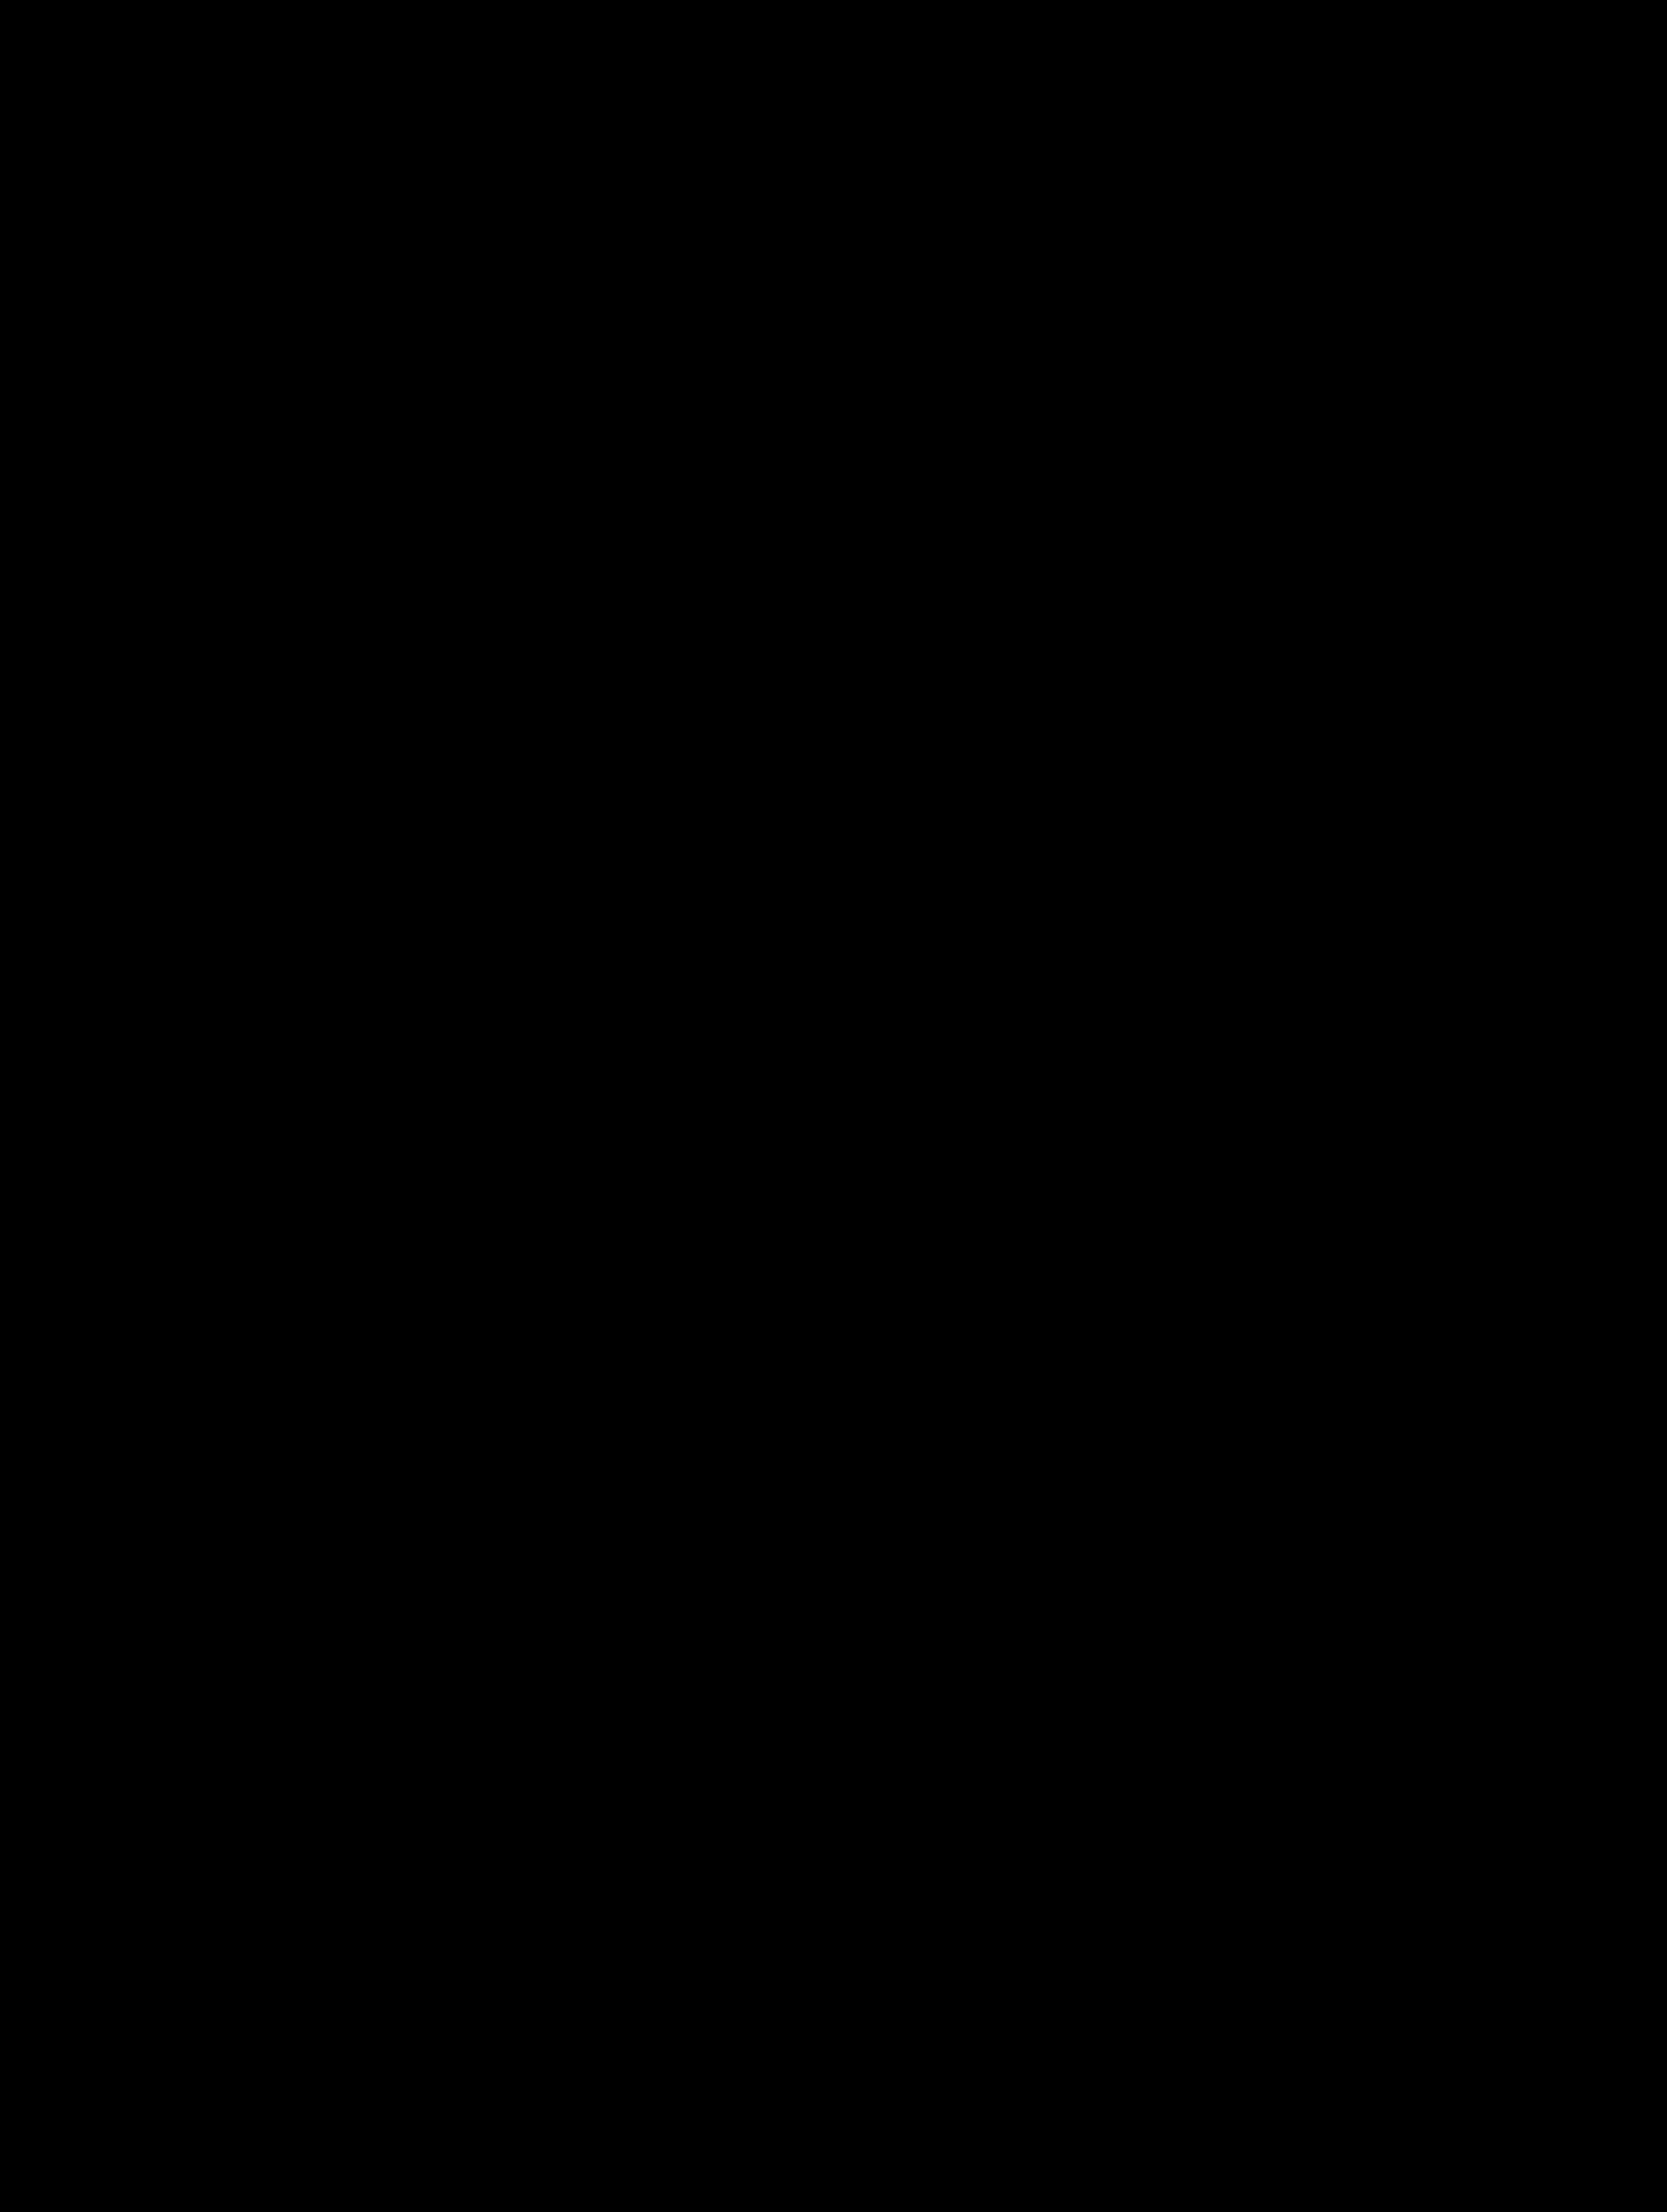 Hamsa Vector